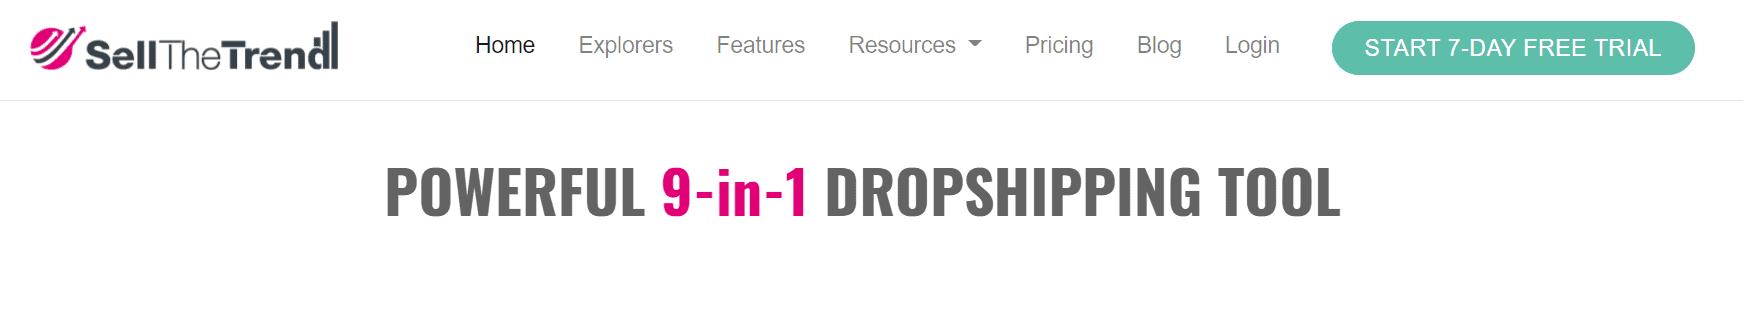 dropshipping tool